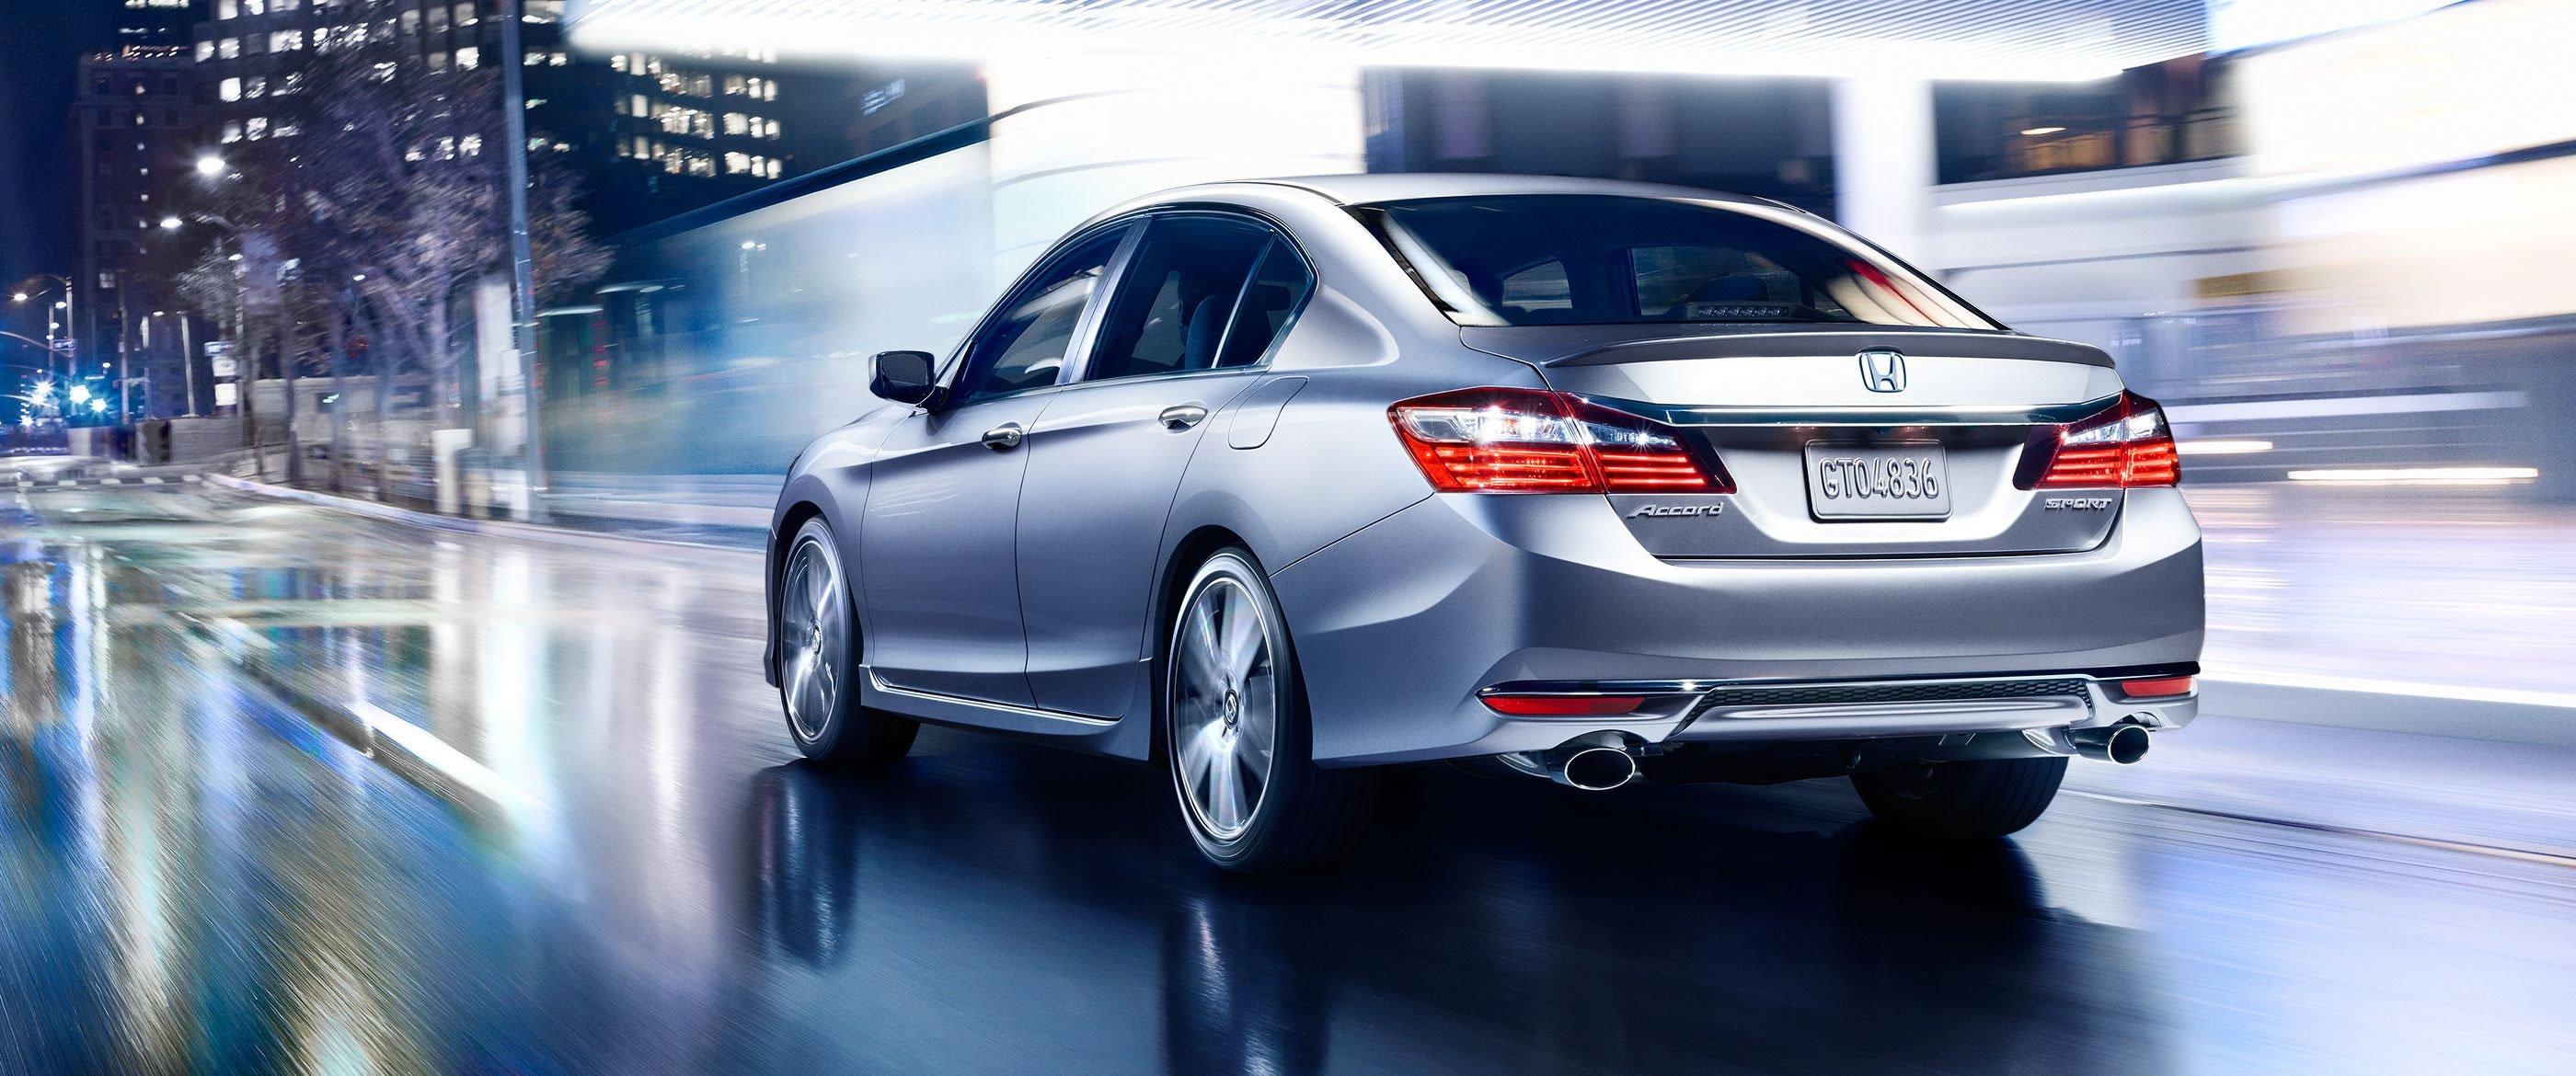 New Honda Accord Lease Deals Boston MA Kelly Honda Dealer Lynn